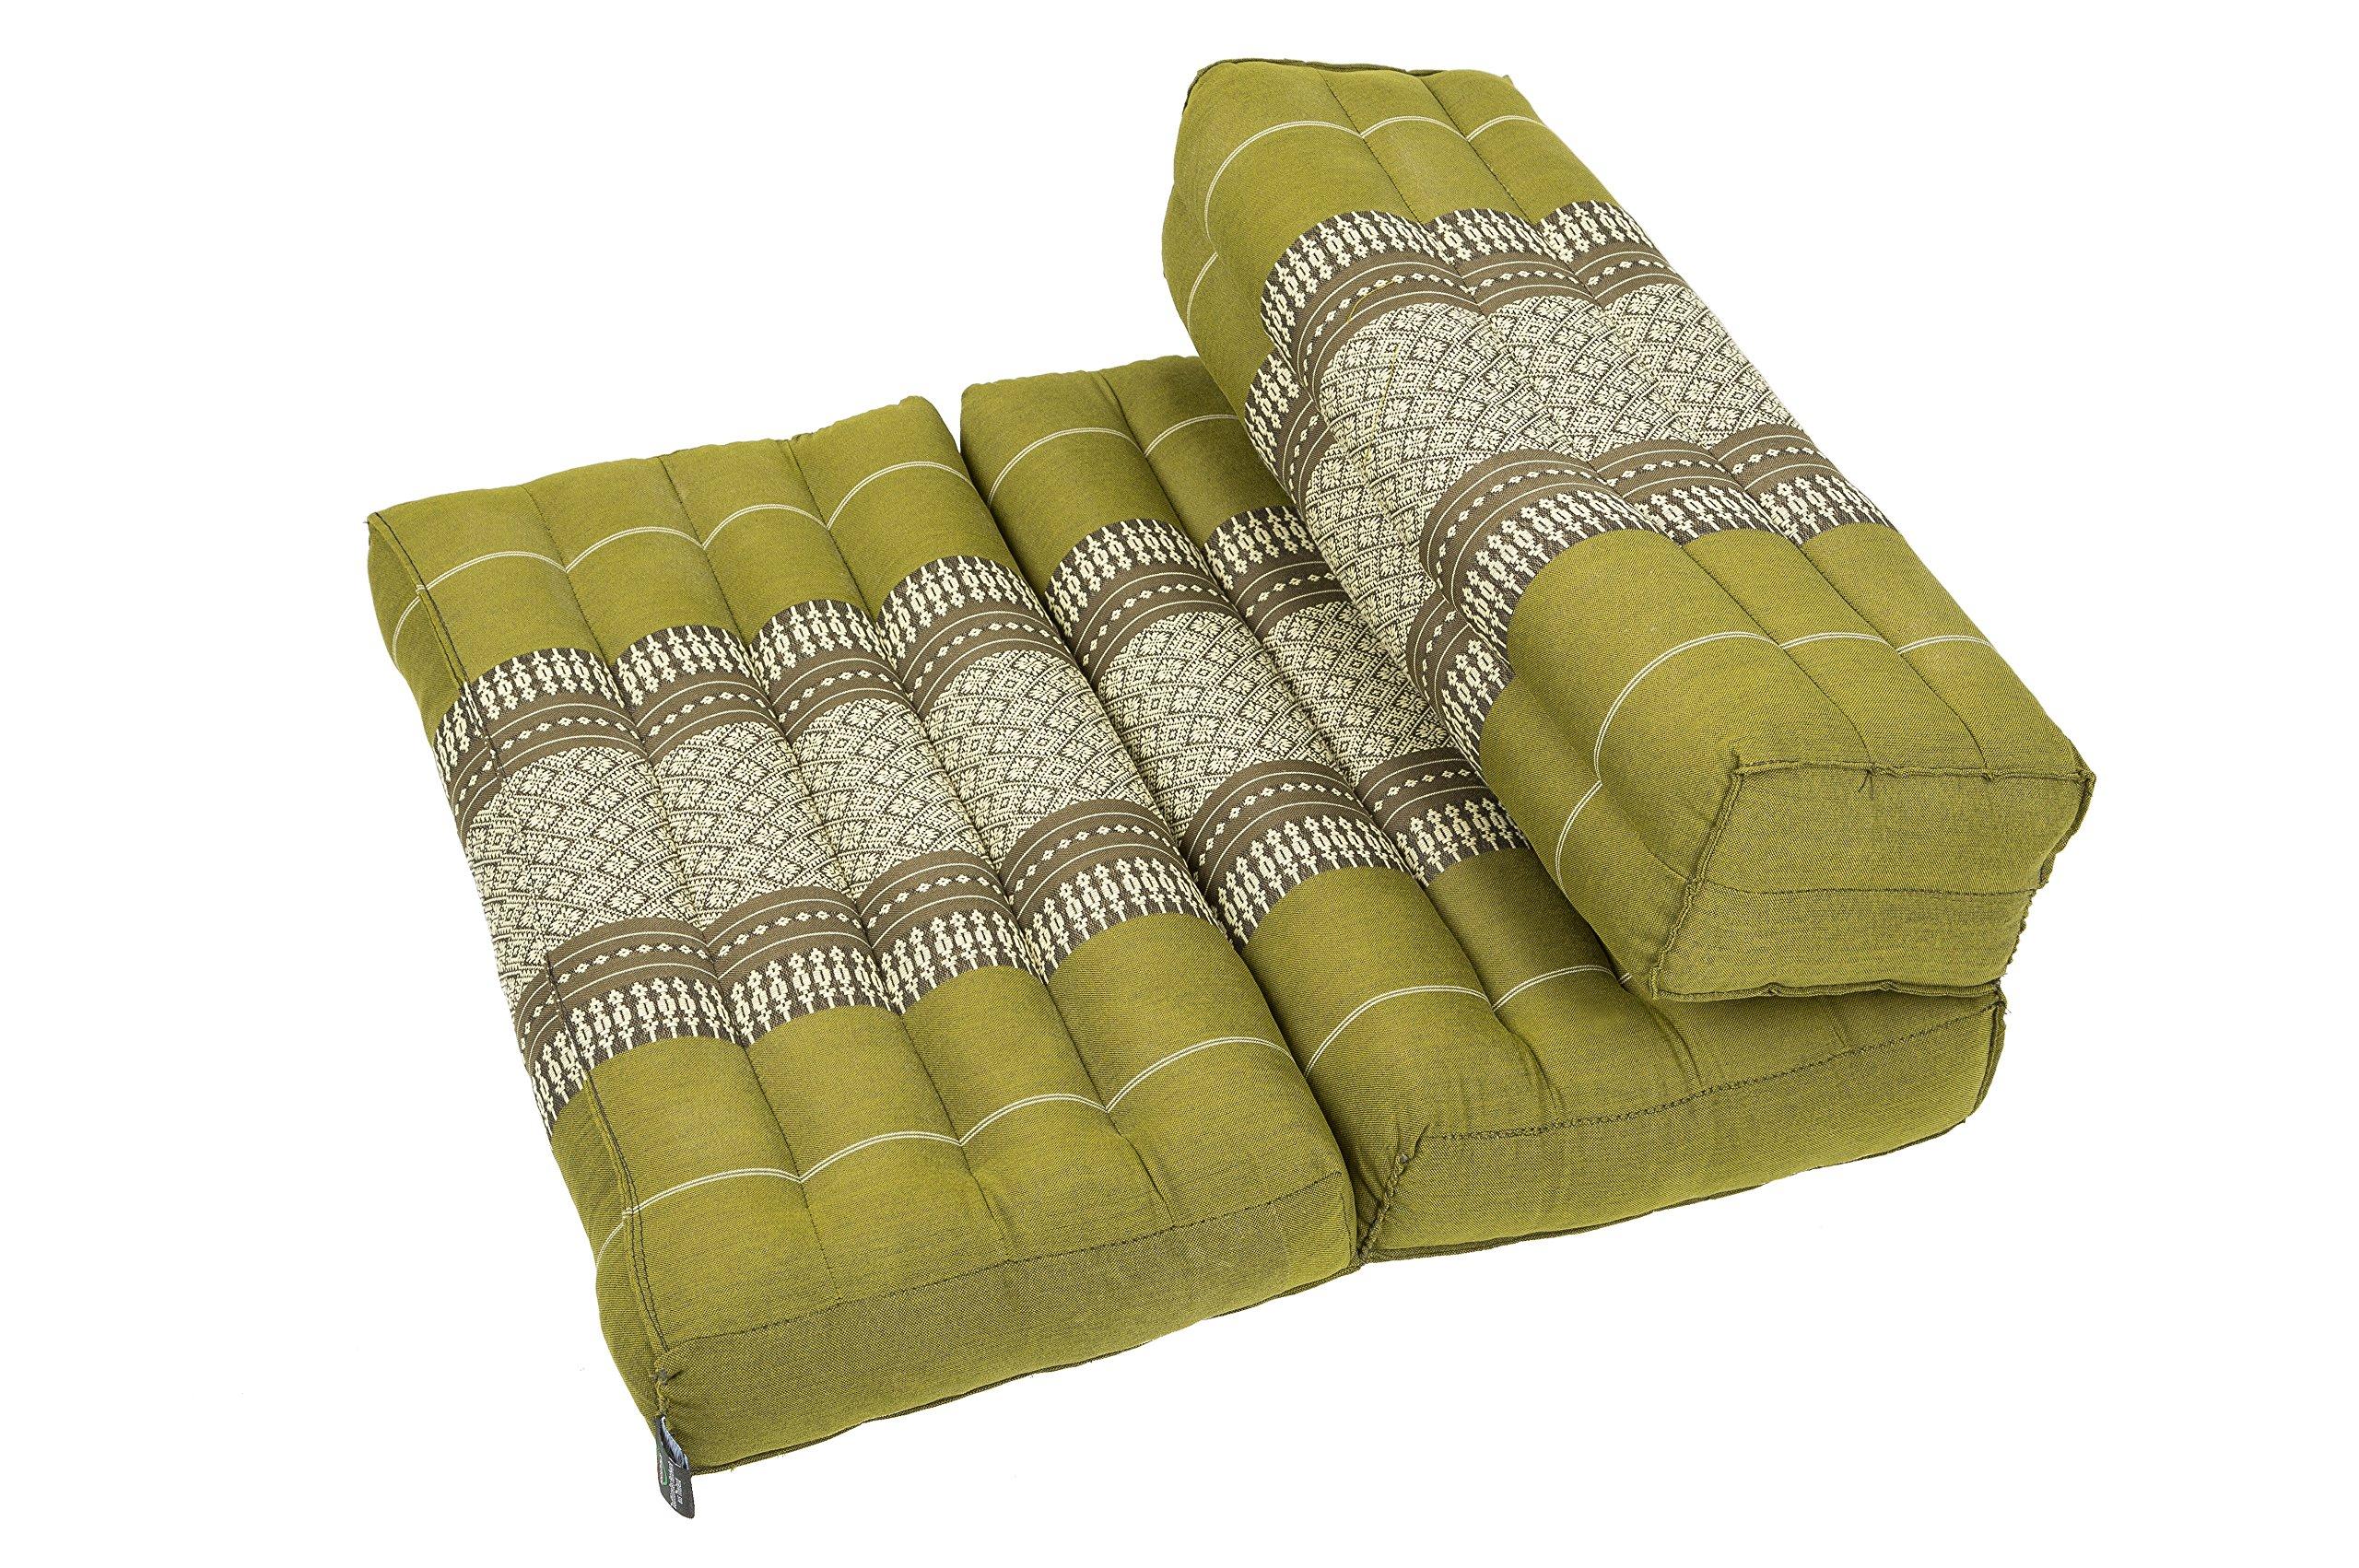 Kapok Dreams; Foldable Meditation Cushion, 100% Kapok Zafu/Zabuton, Thai Design bamboo green by Kapok Dreams